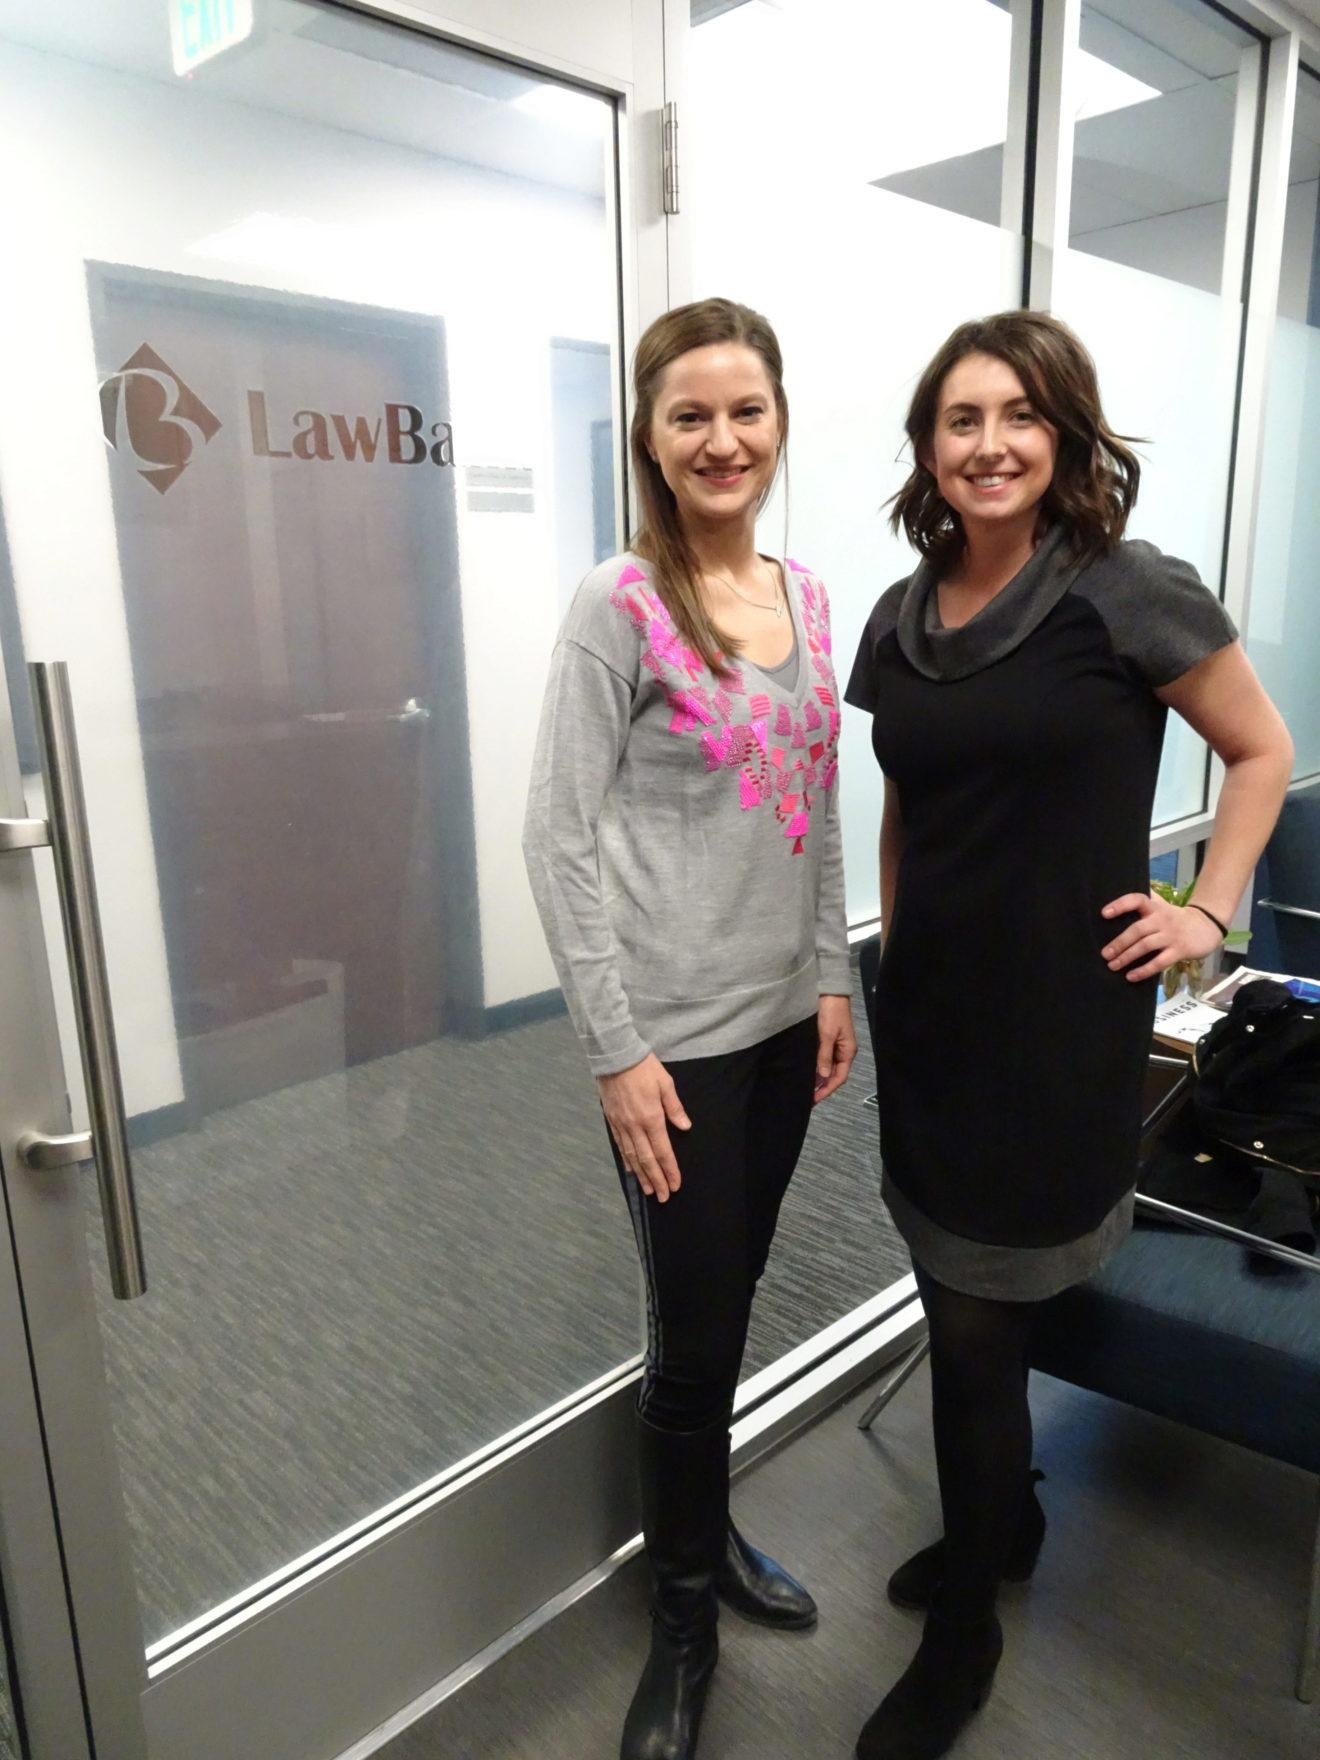 Photo of team members Heather and Megan standing at LawBank